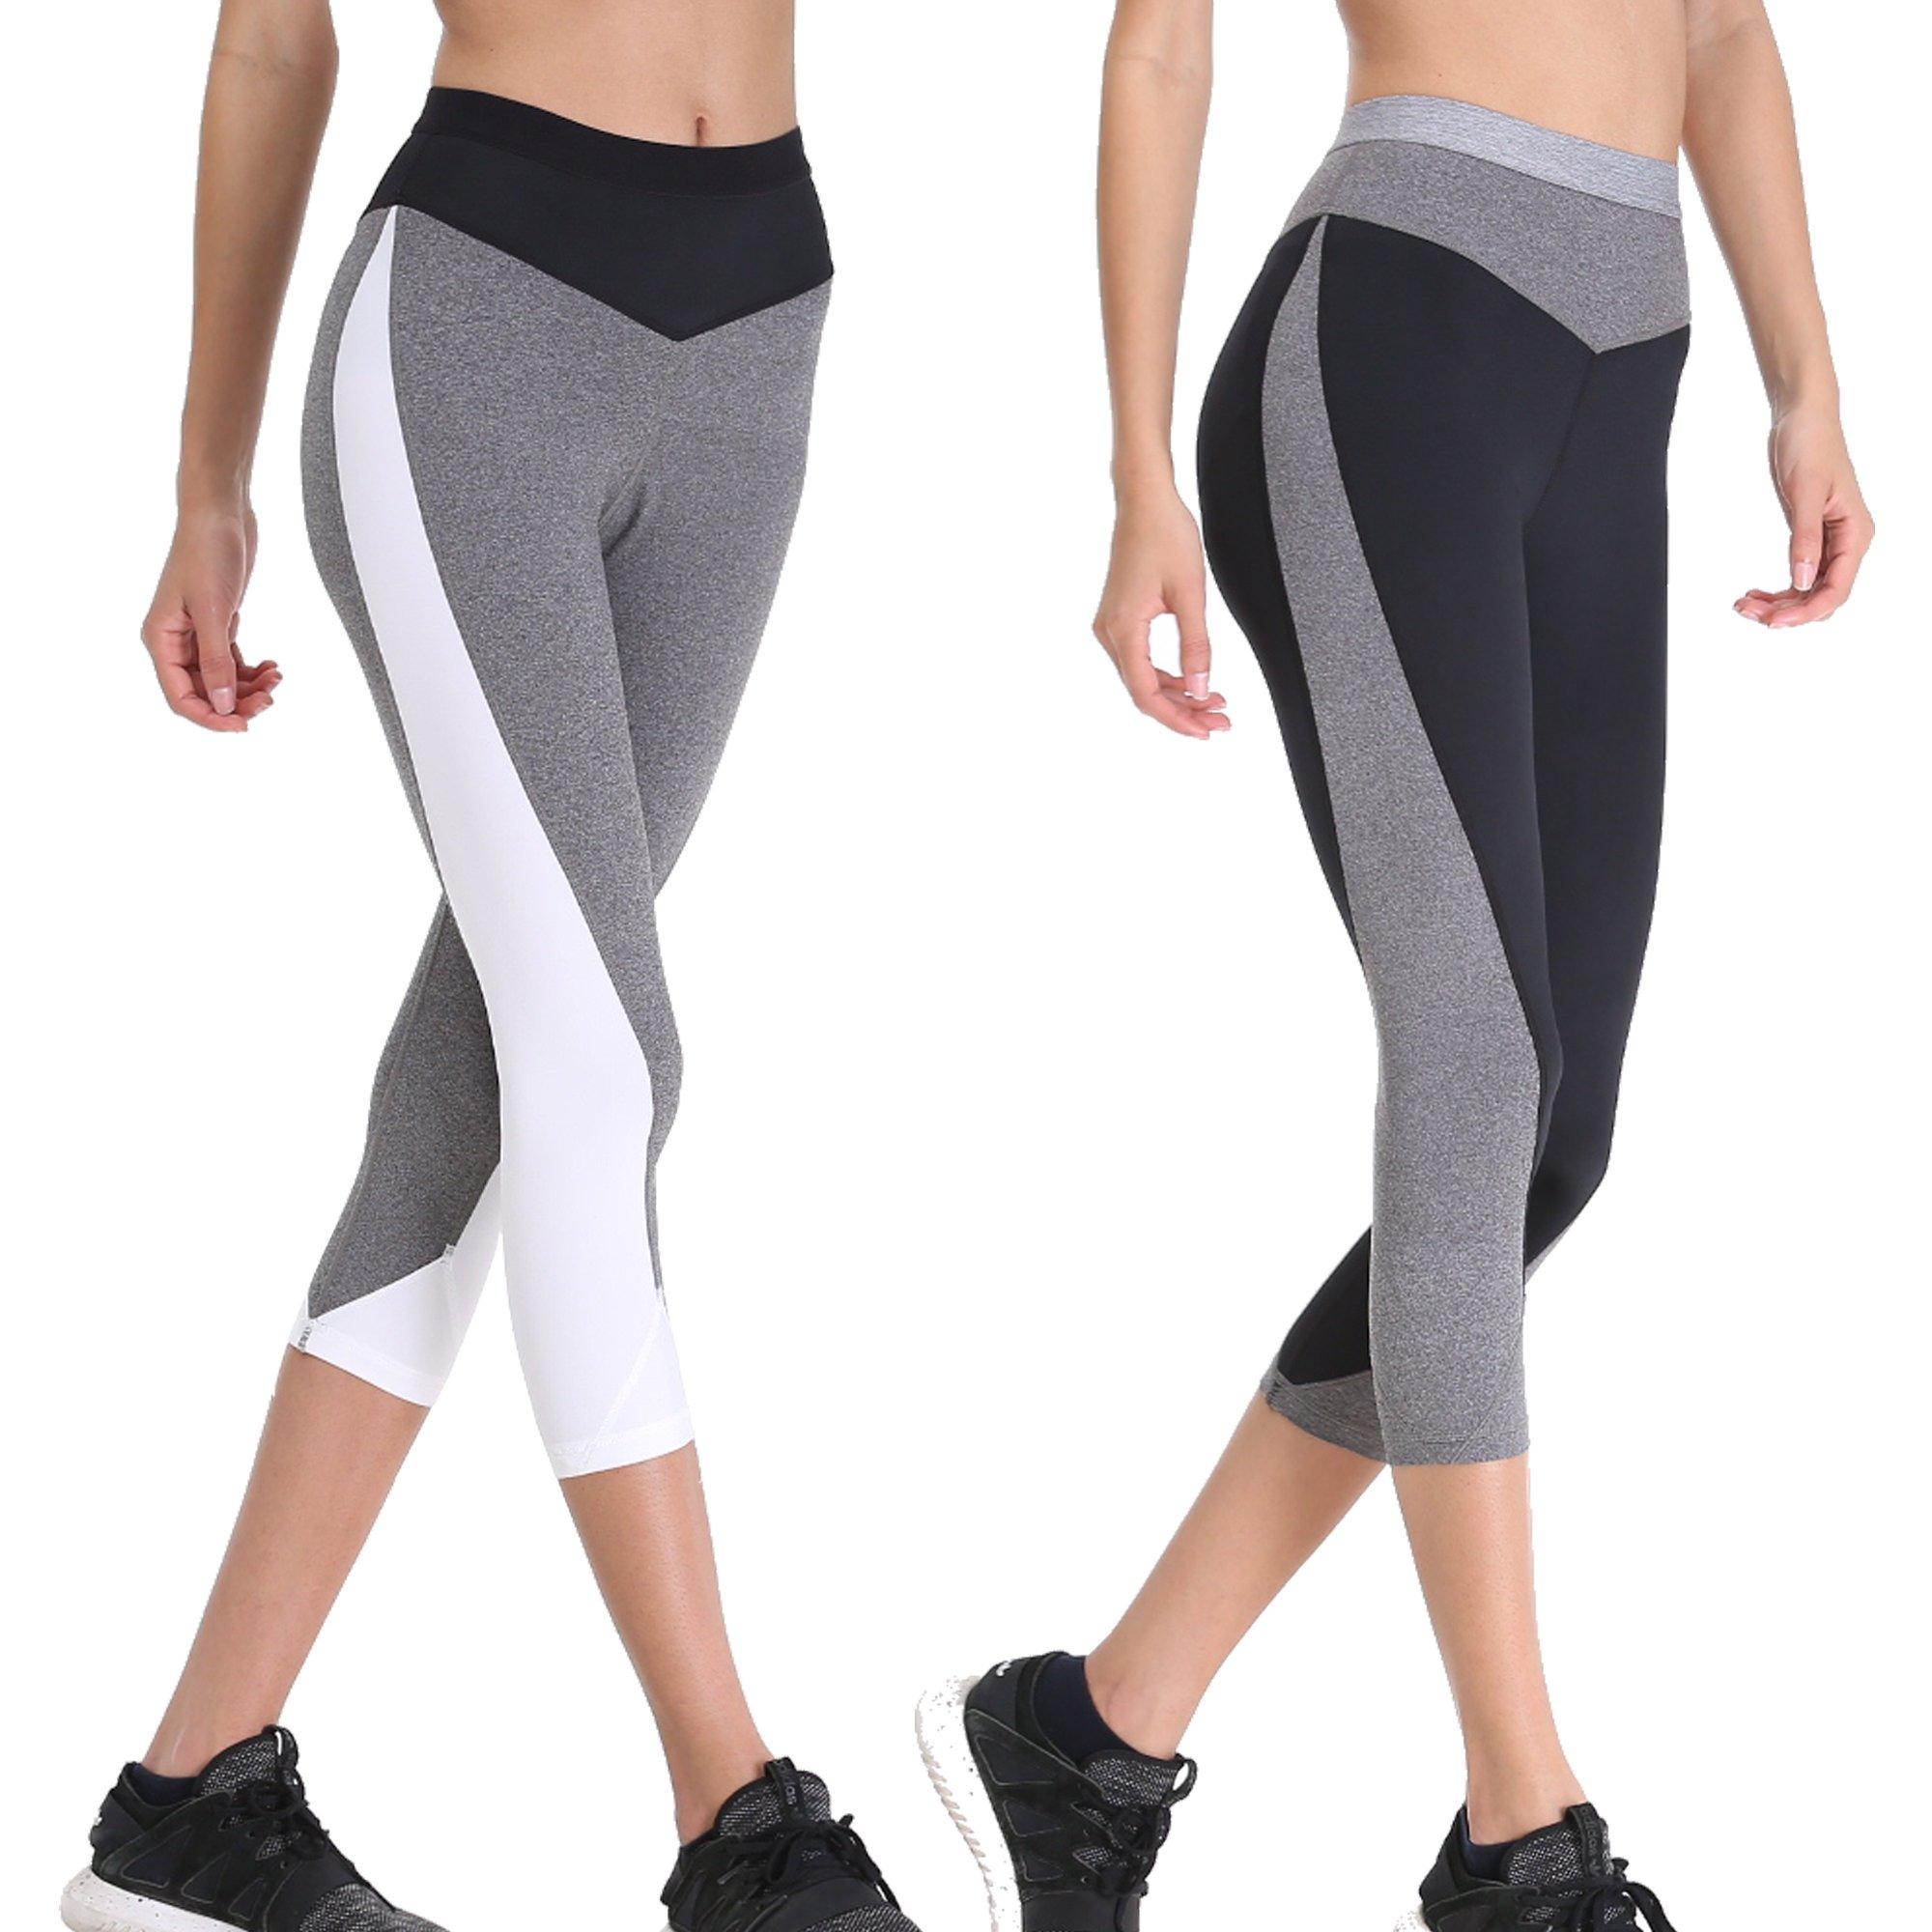 Curve Muse Women Slim Fit High Waist Yoga Pants Leggings Workout Activeware 2PK